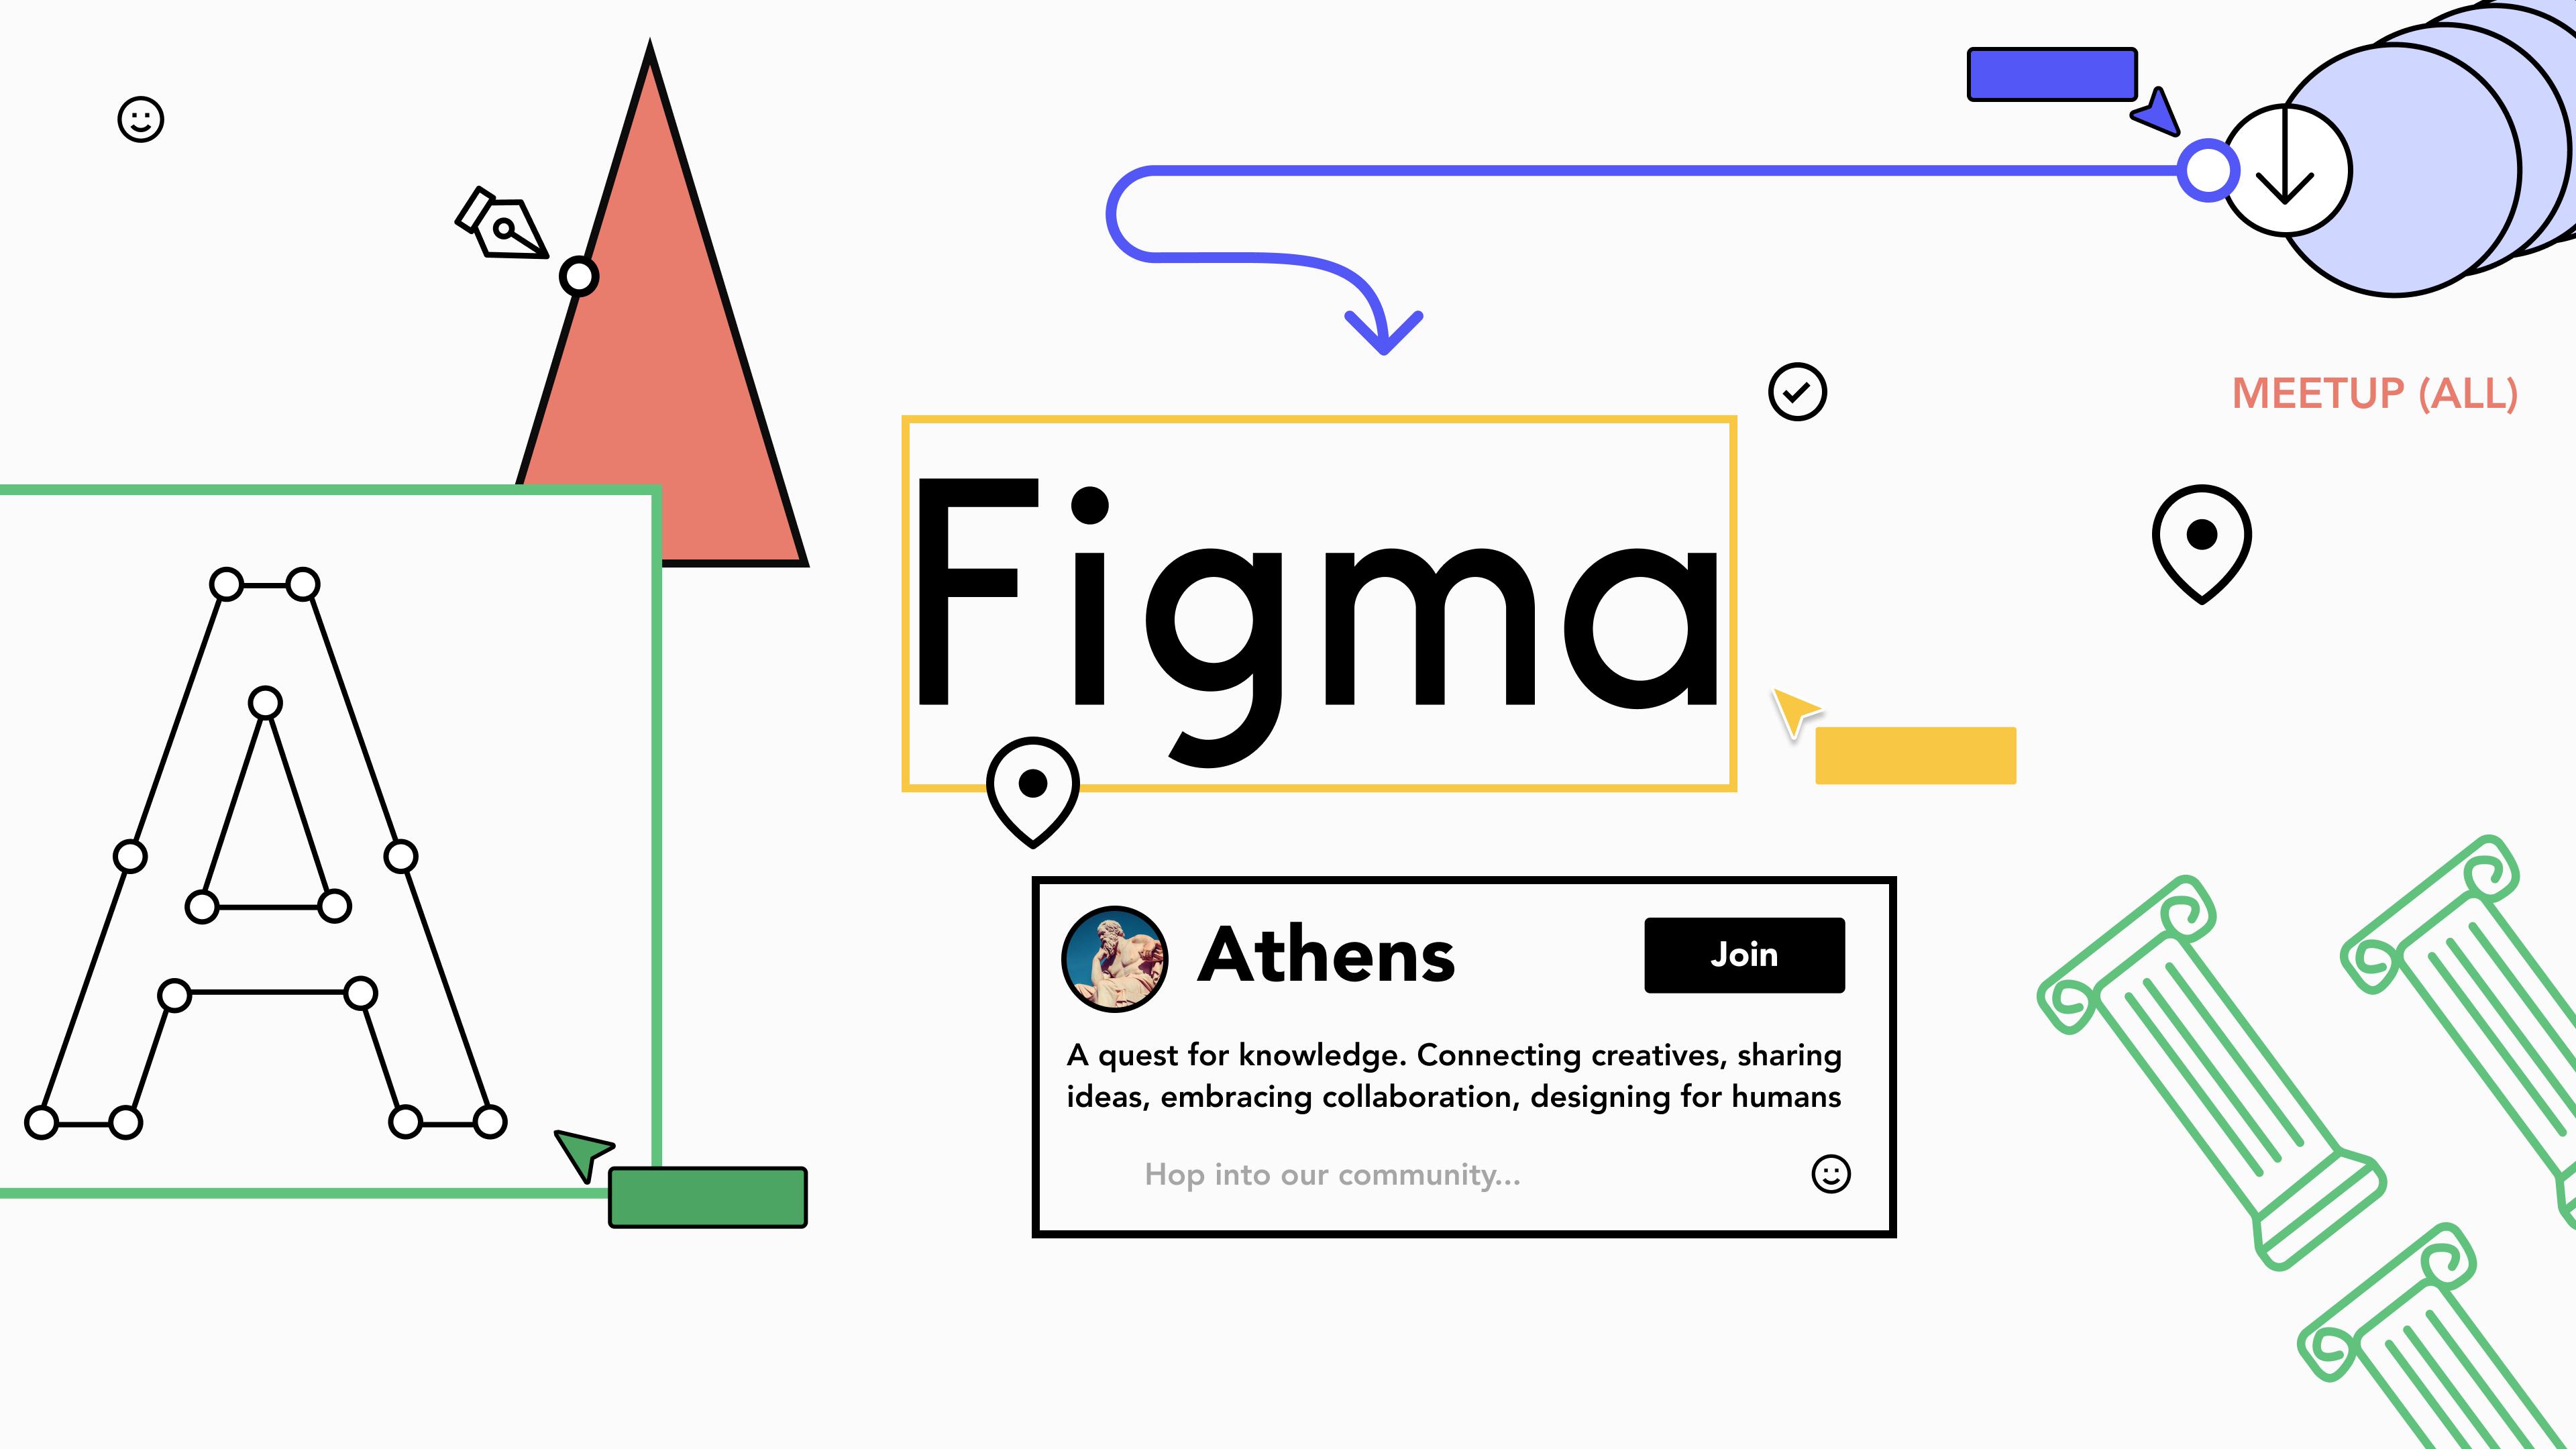 Figma Athens